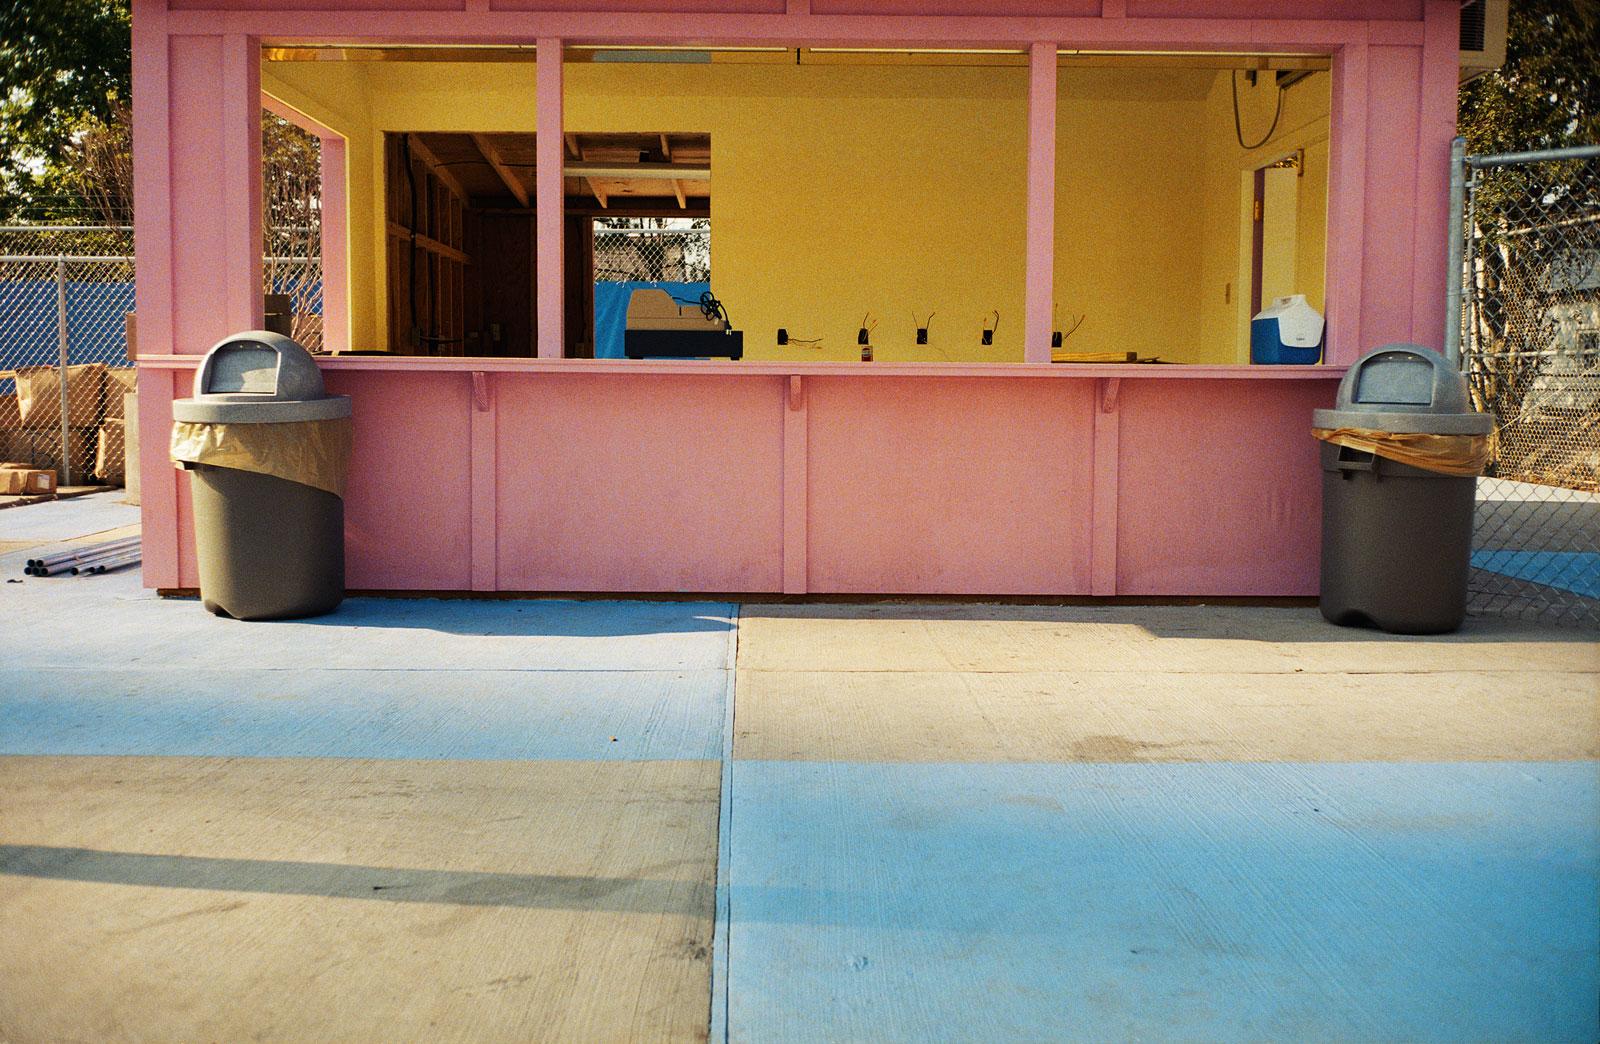 eggleston-concession